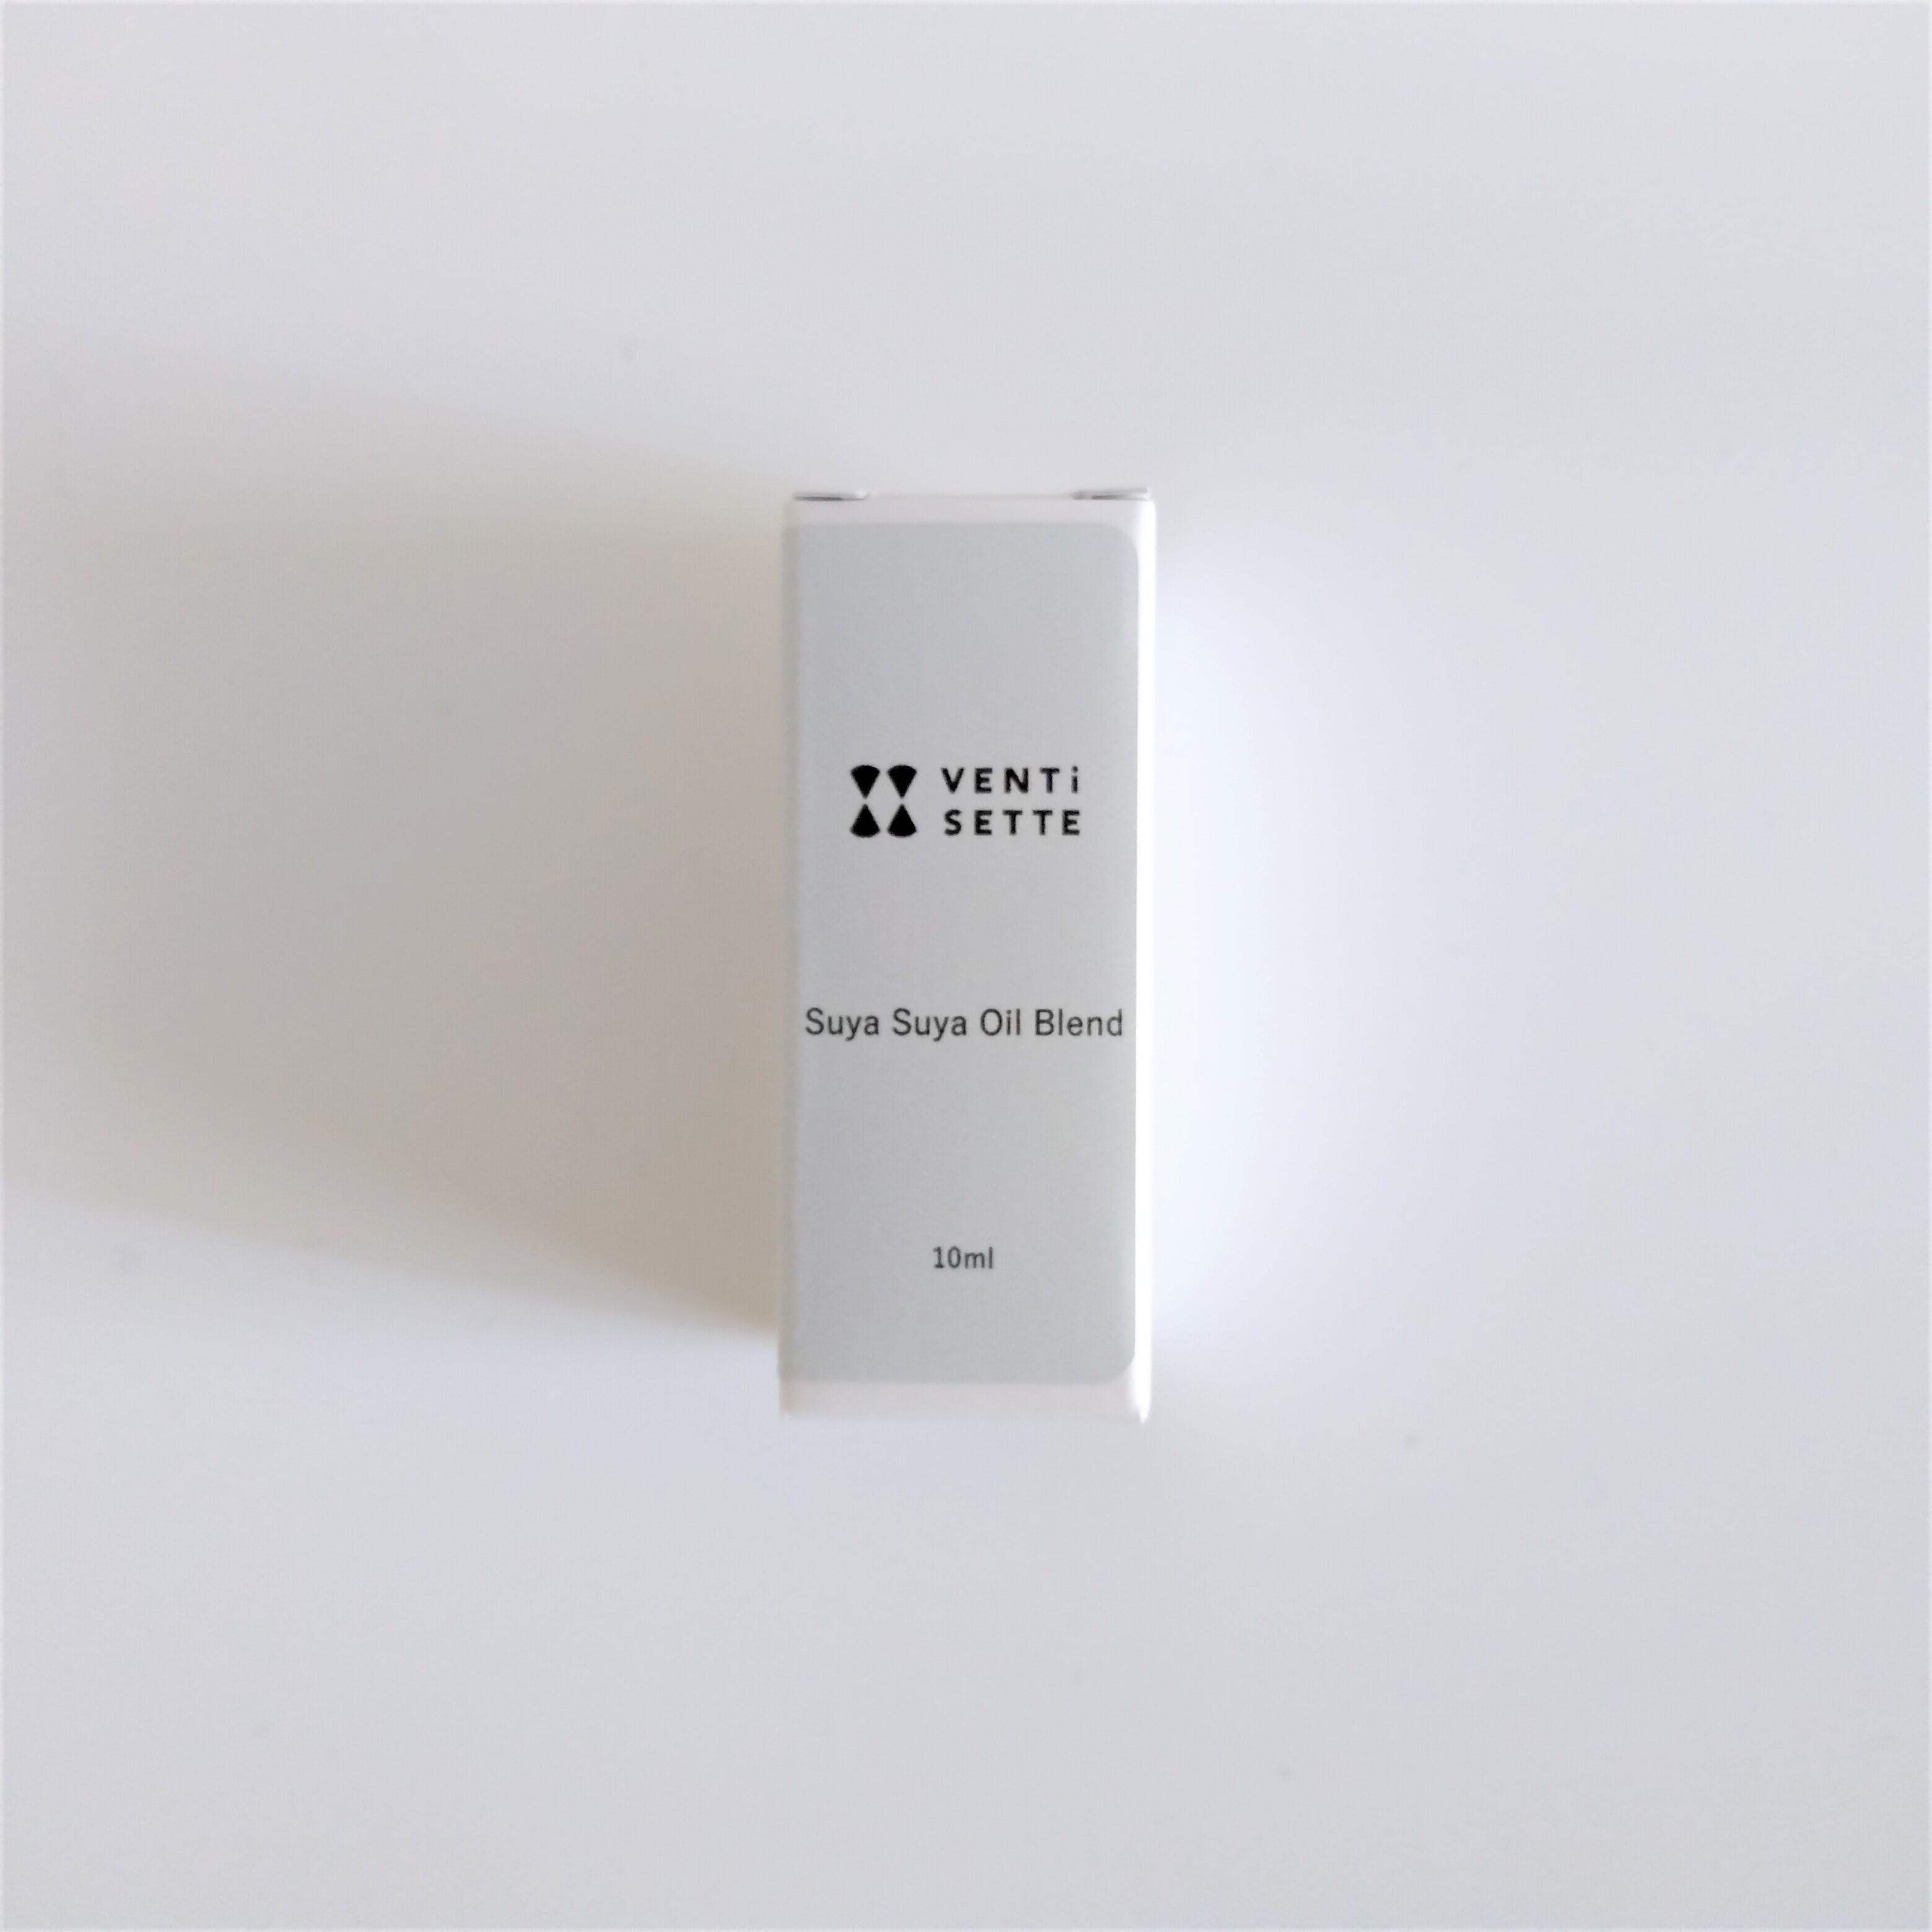 SuyaSuya(スヤスヤ)ブレンドエッセンシャルオイル 10ml